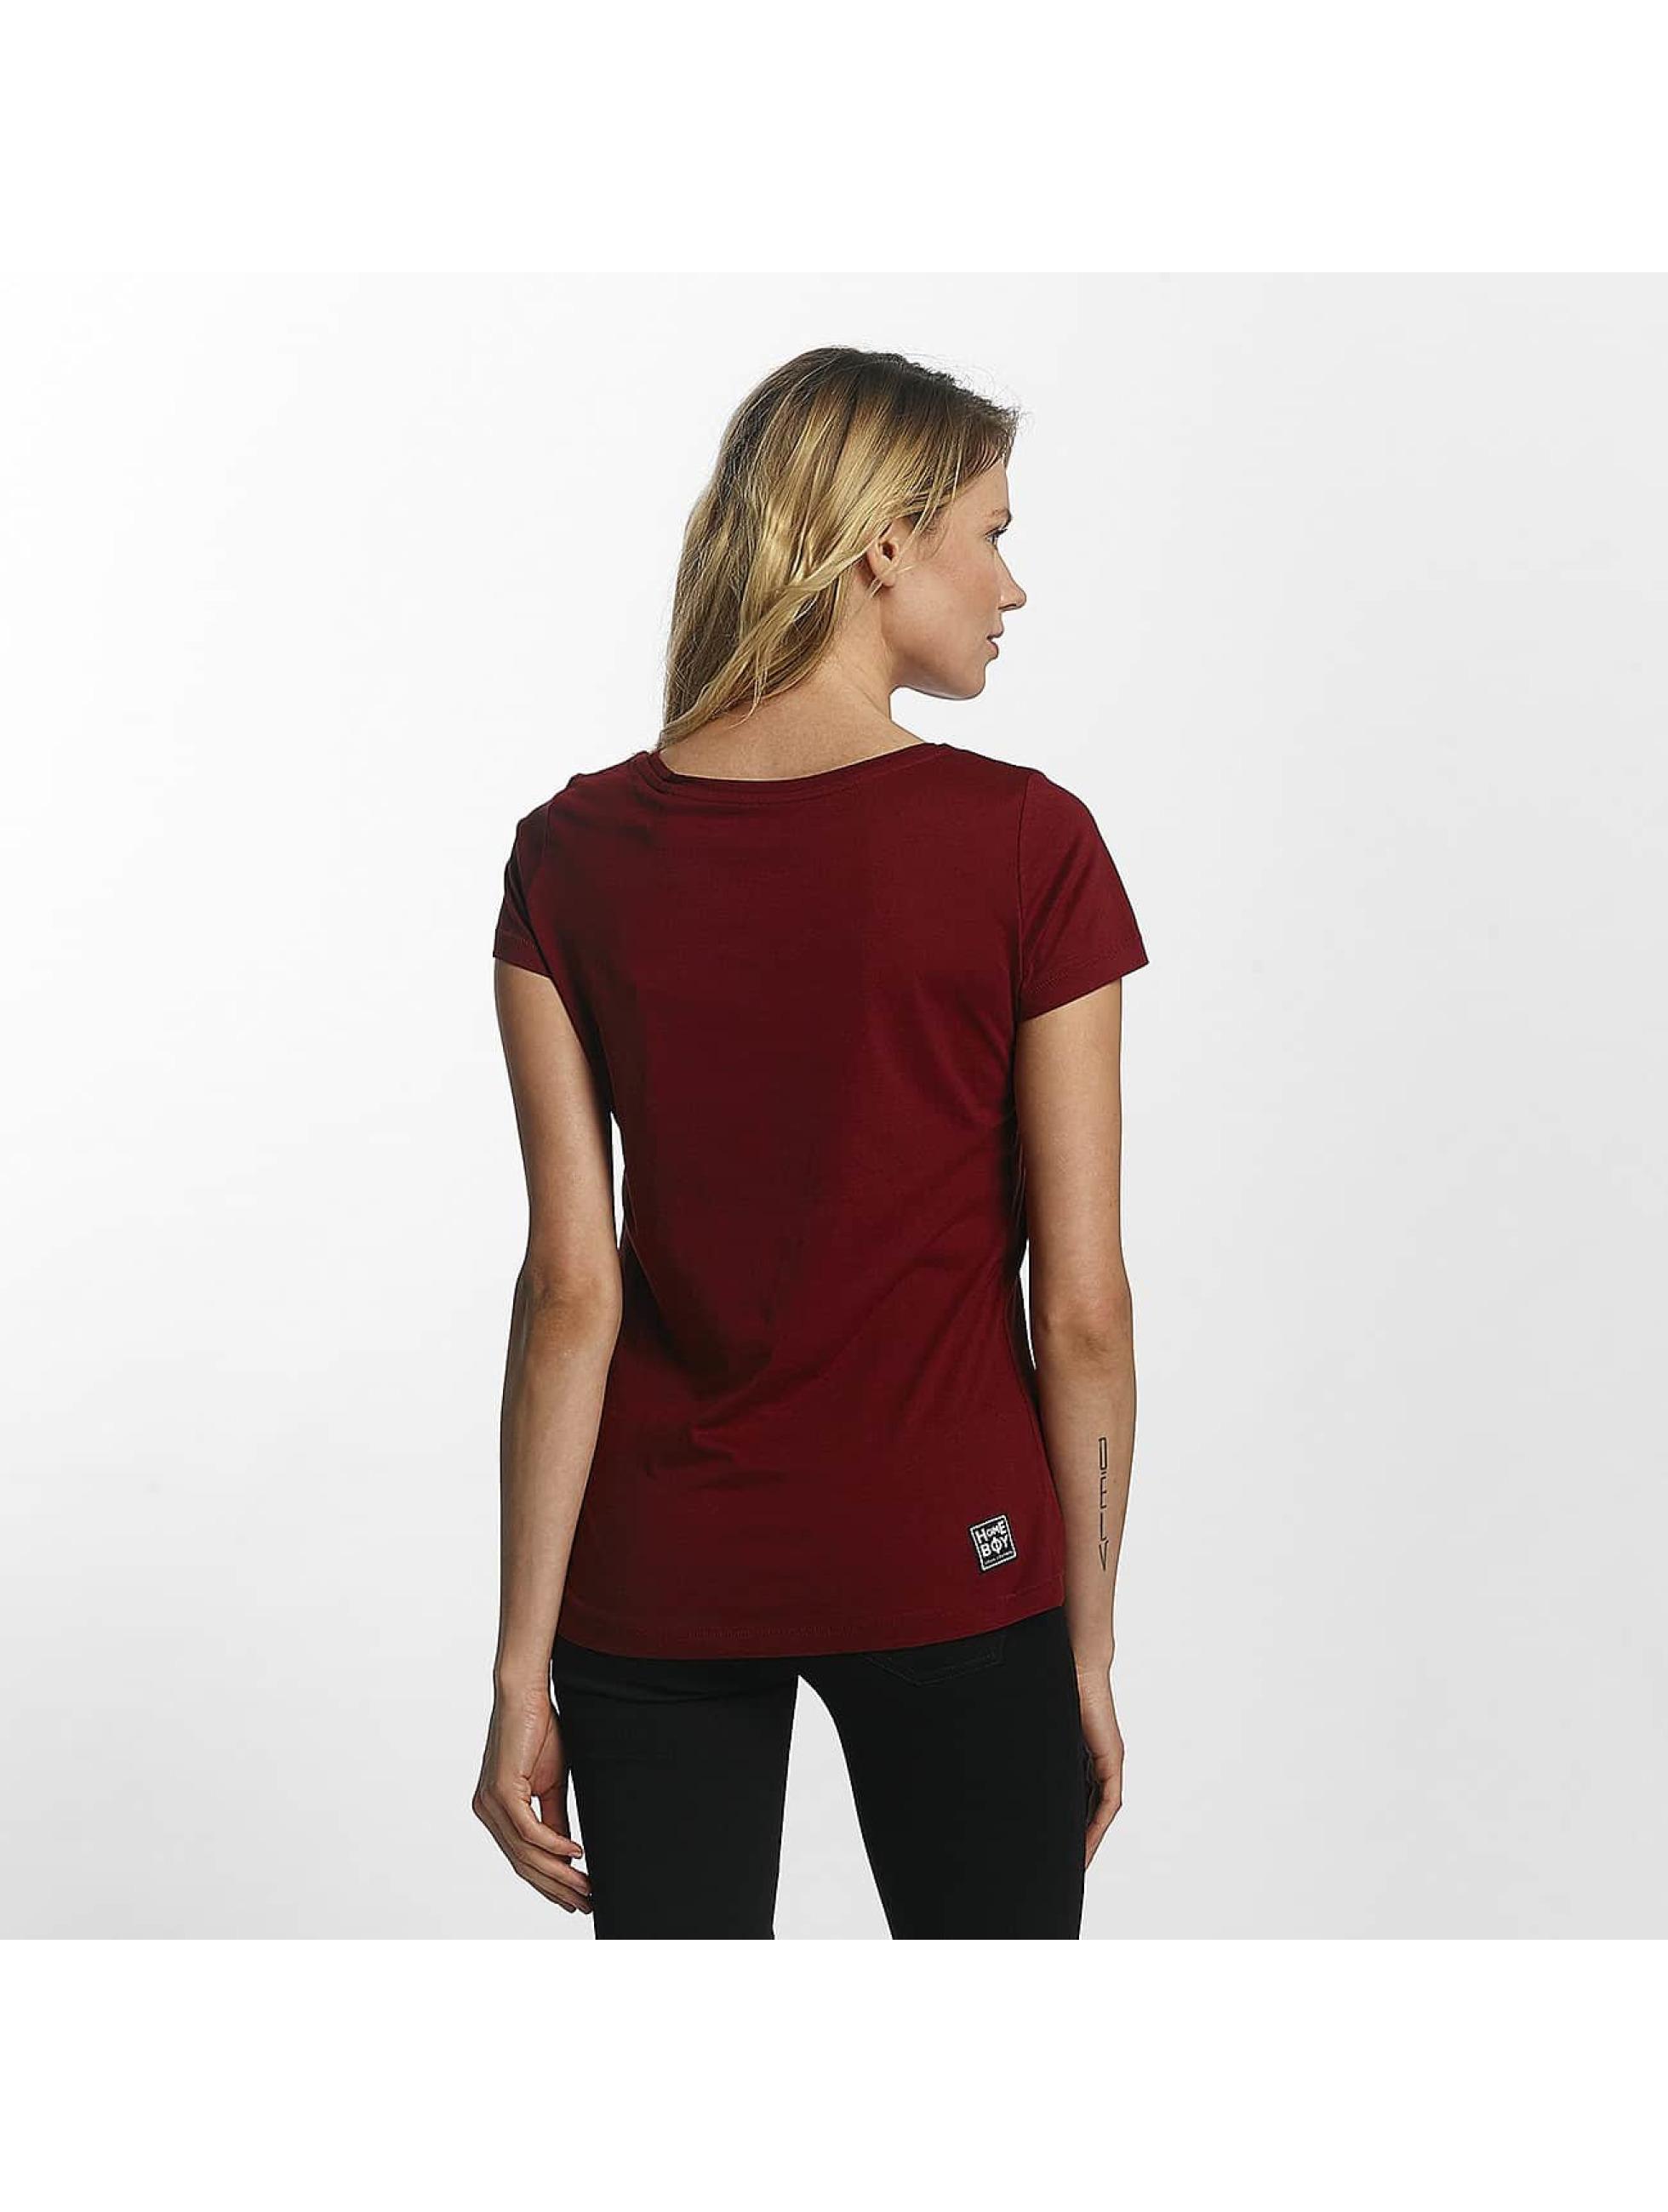 Homeboy T-paidat Paris punainen